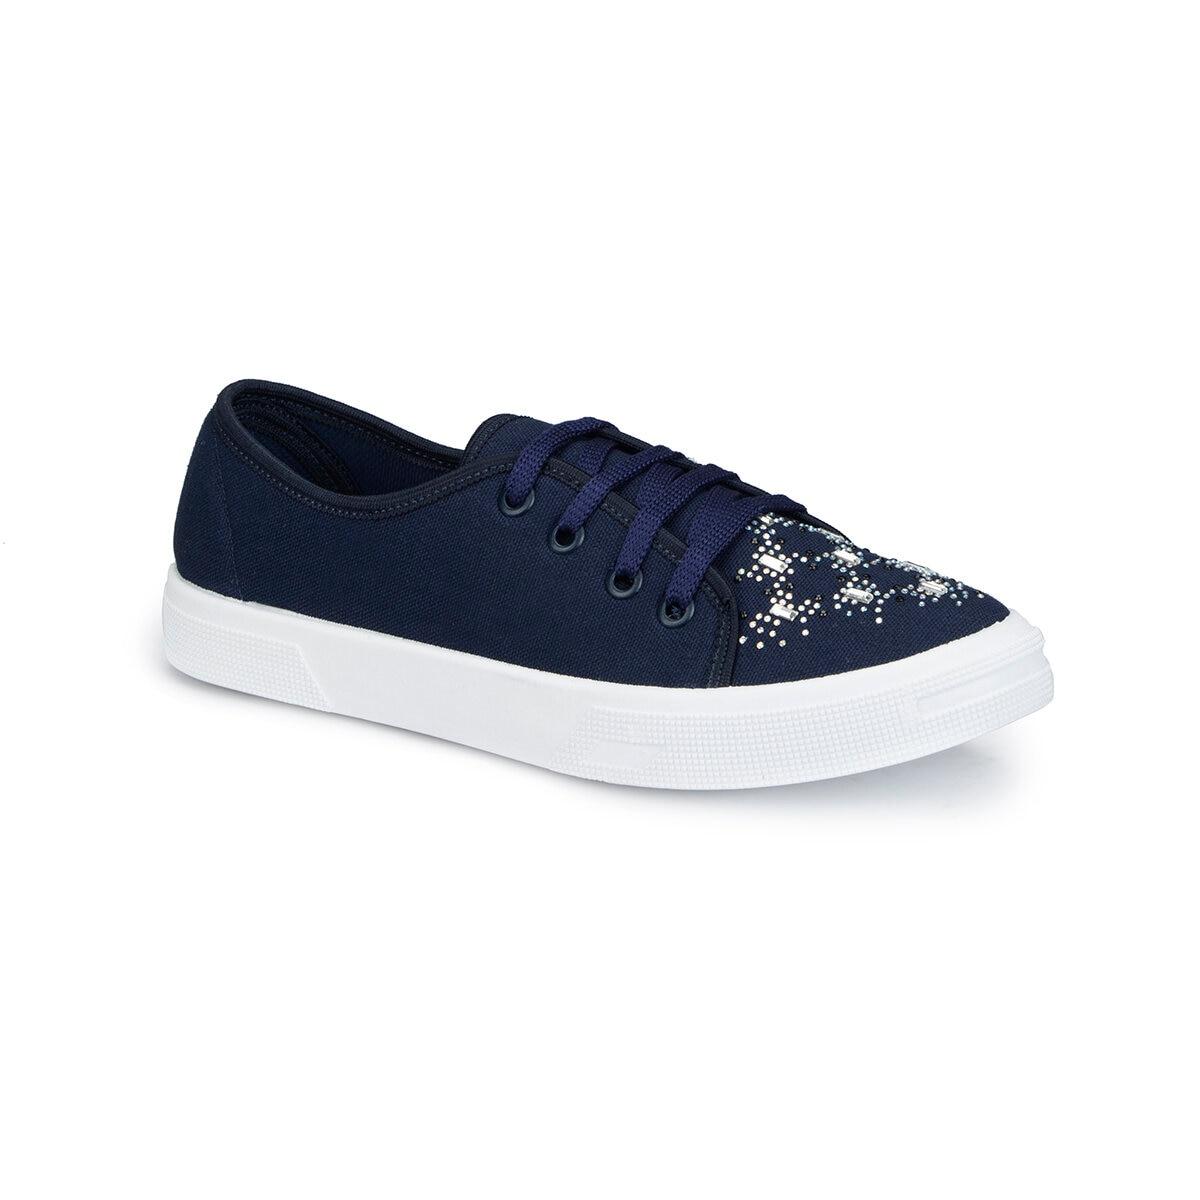 FLO 81.311604.Z Navy Blue Women 'S Sneaker Shoes Polaris